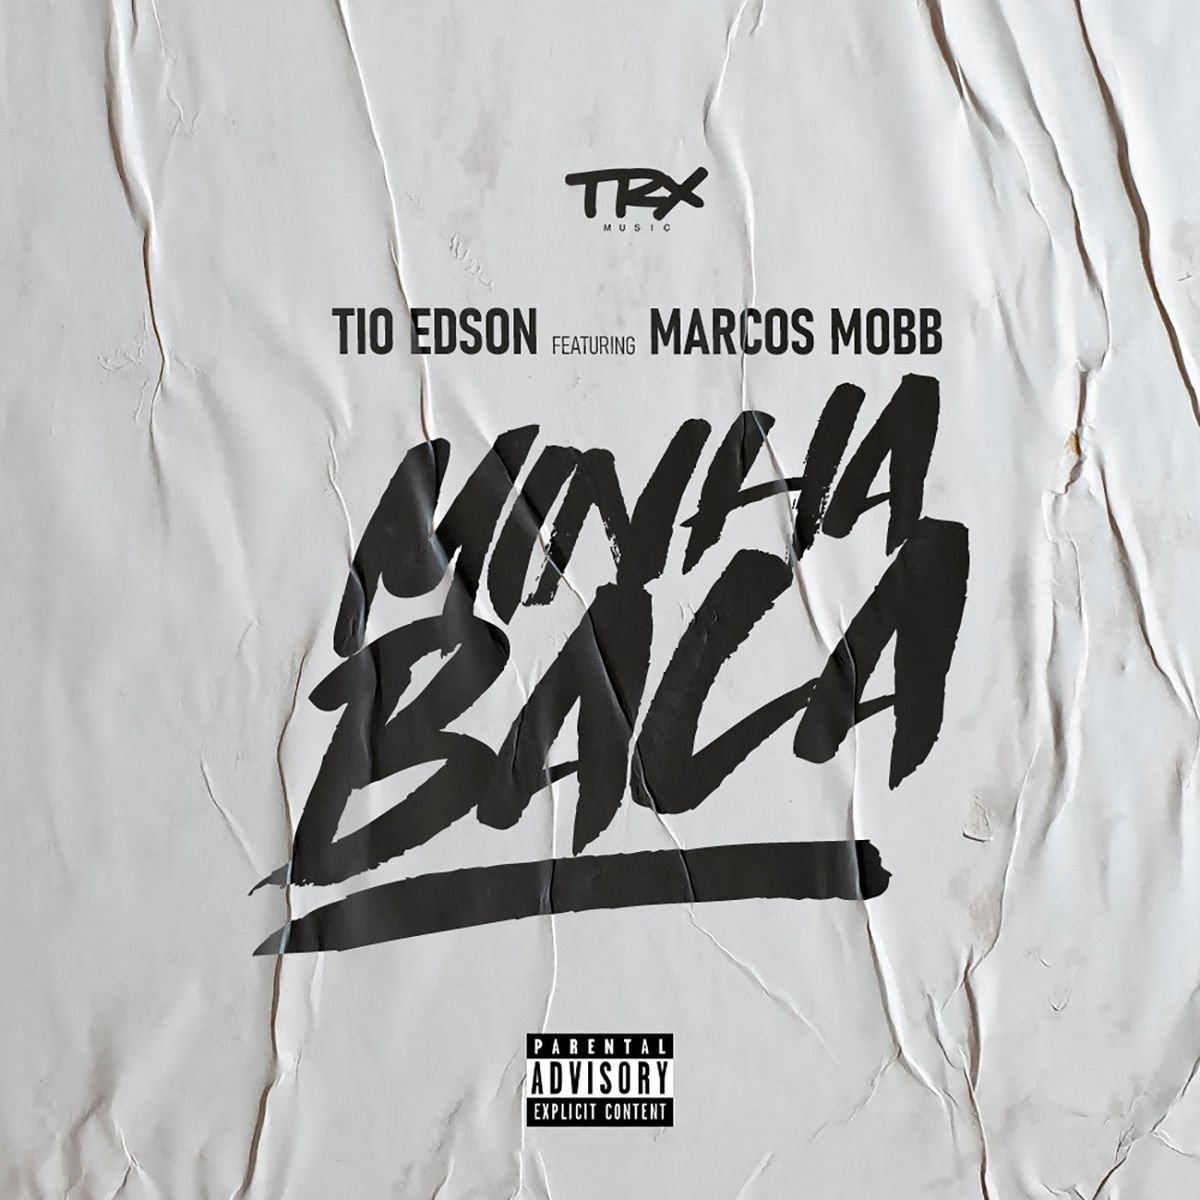 Tio Edson feat. Marcos Mobb - Minha Tropa [Download]